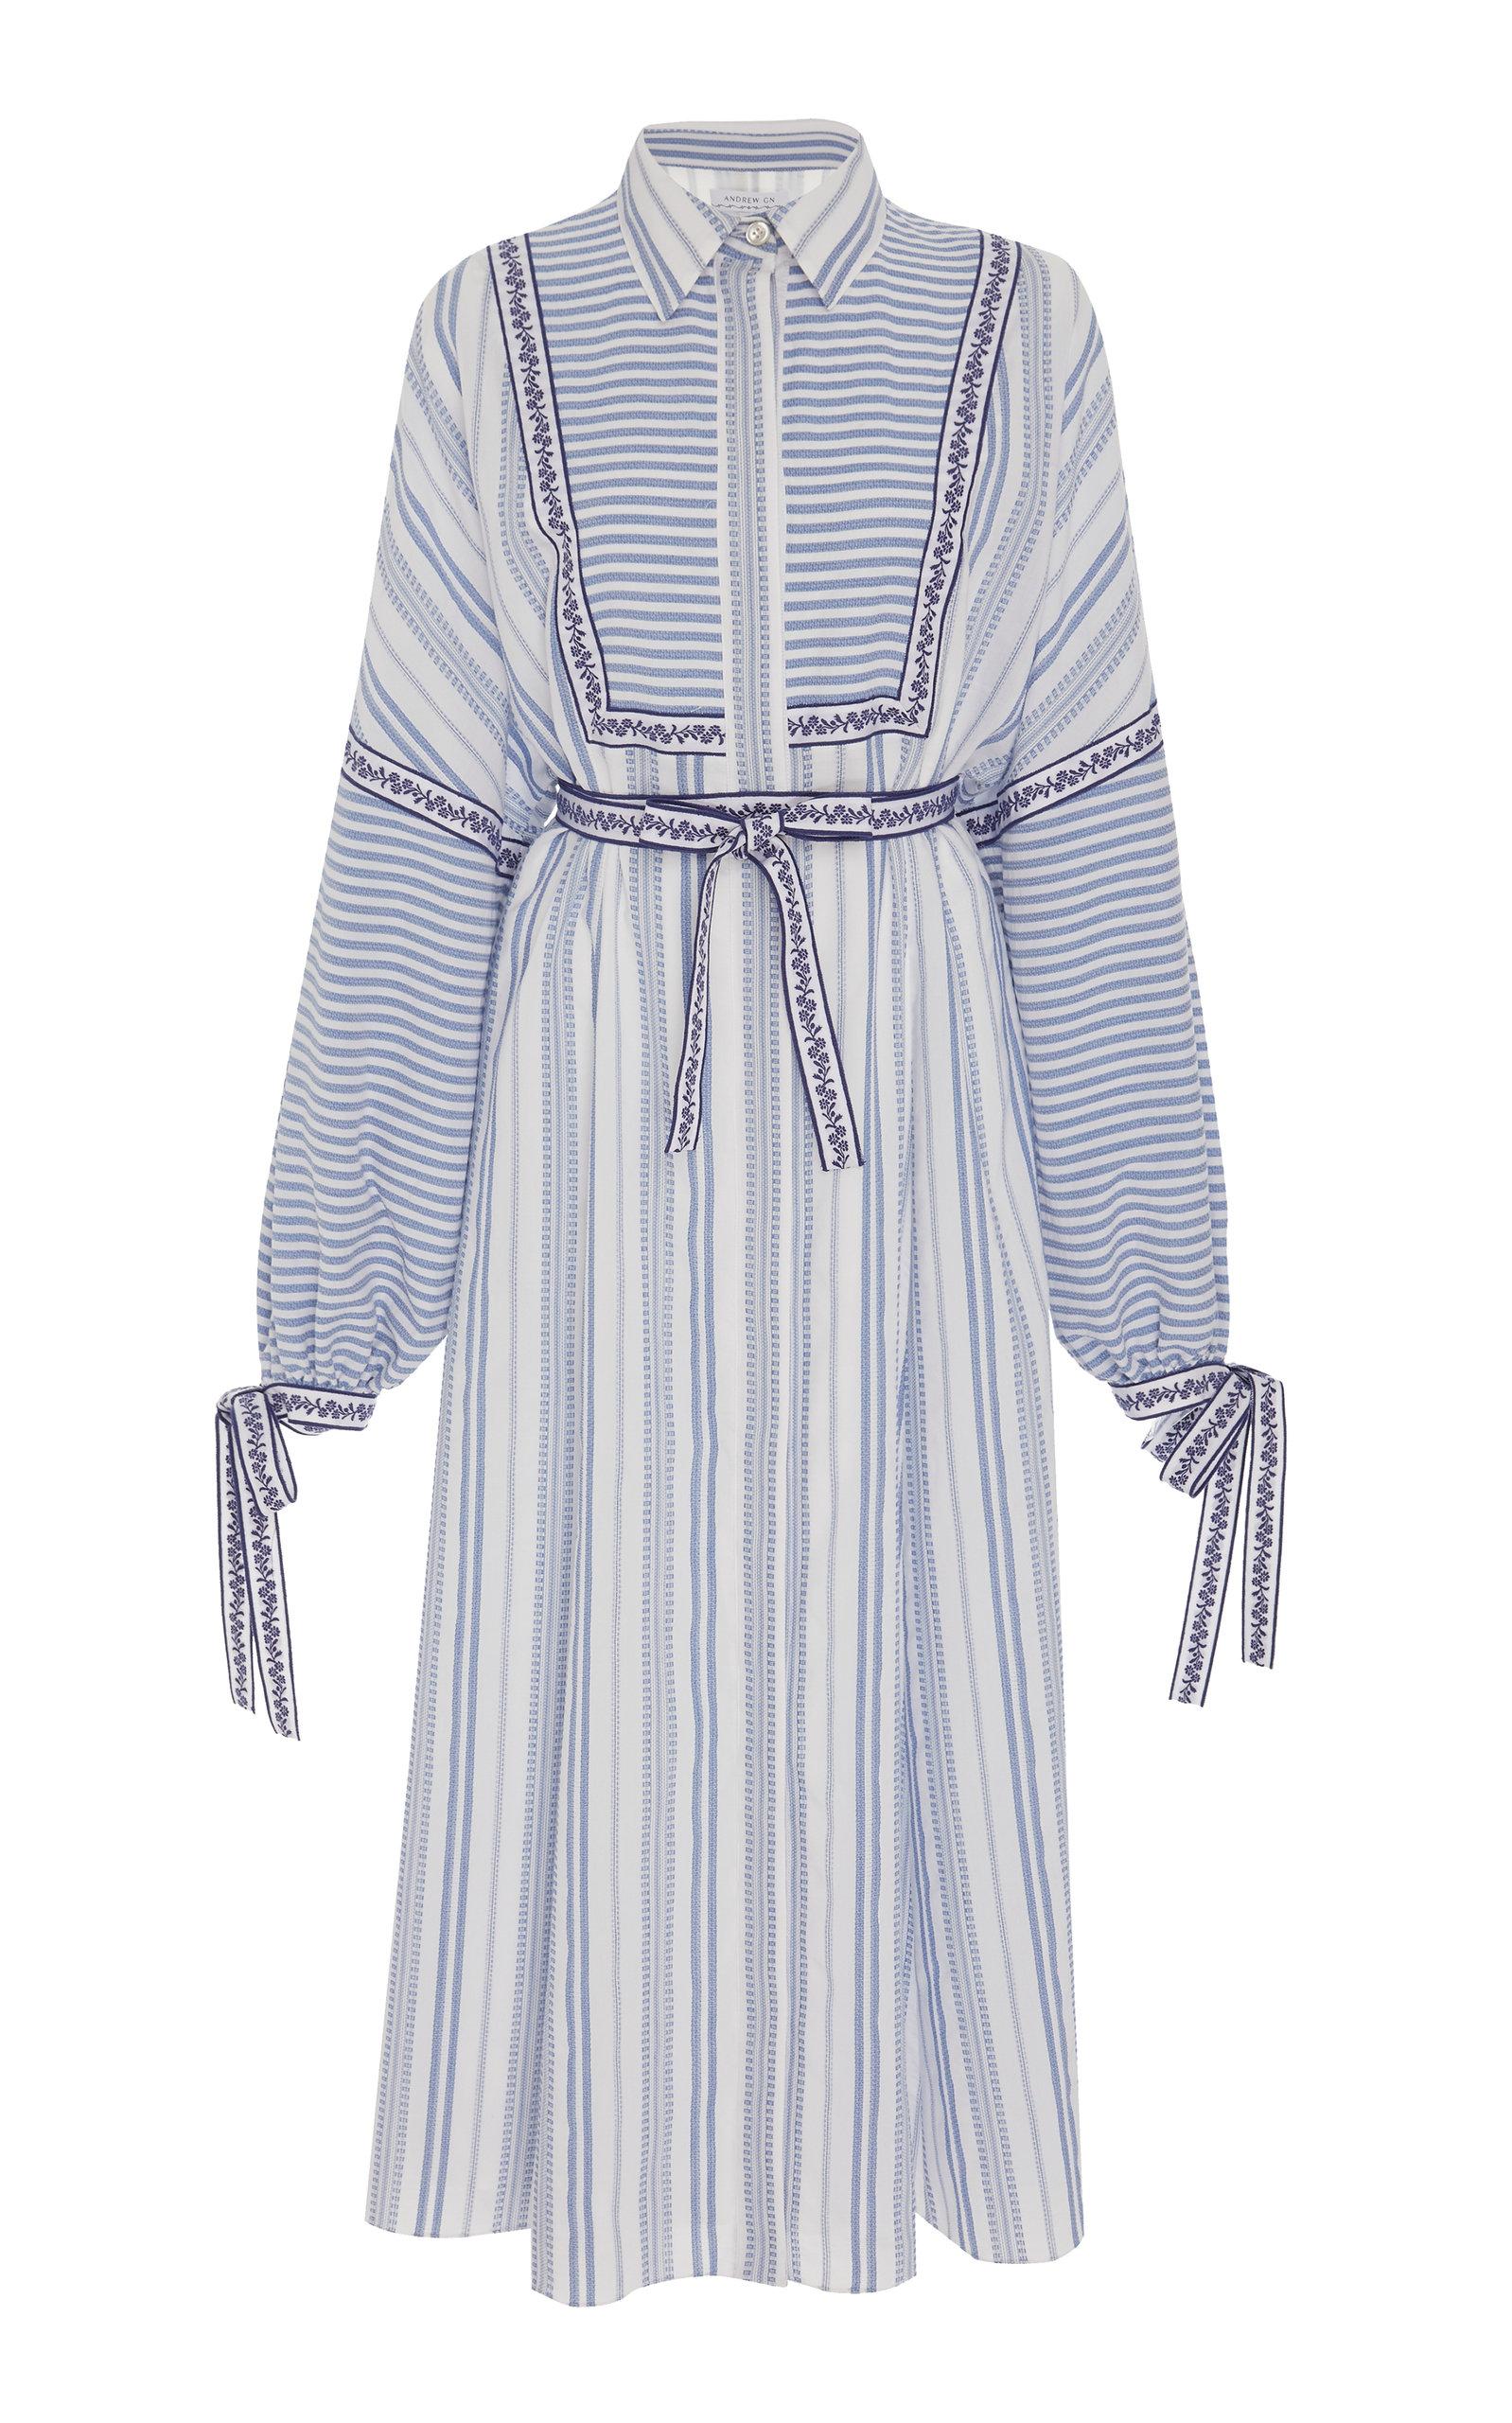 ANDREW GN Long-Sleeve Tie-Waist Striped Dress